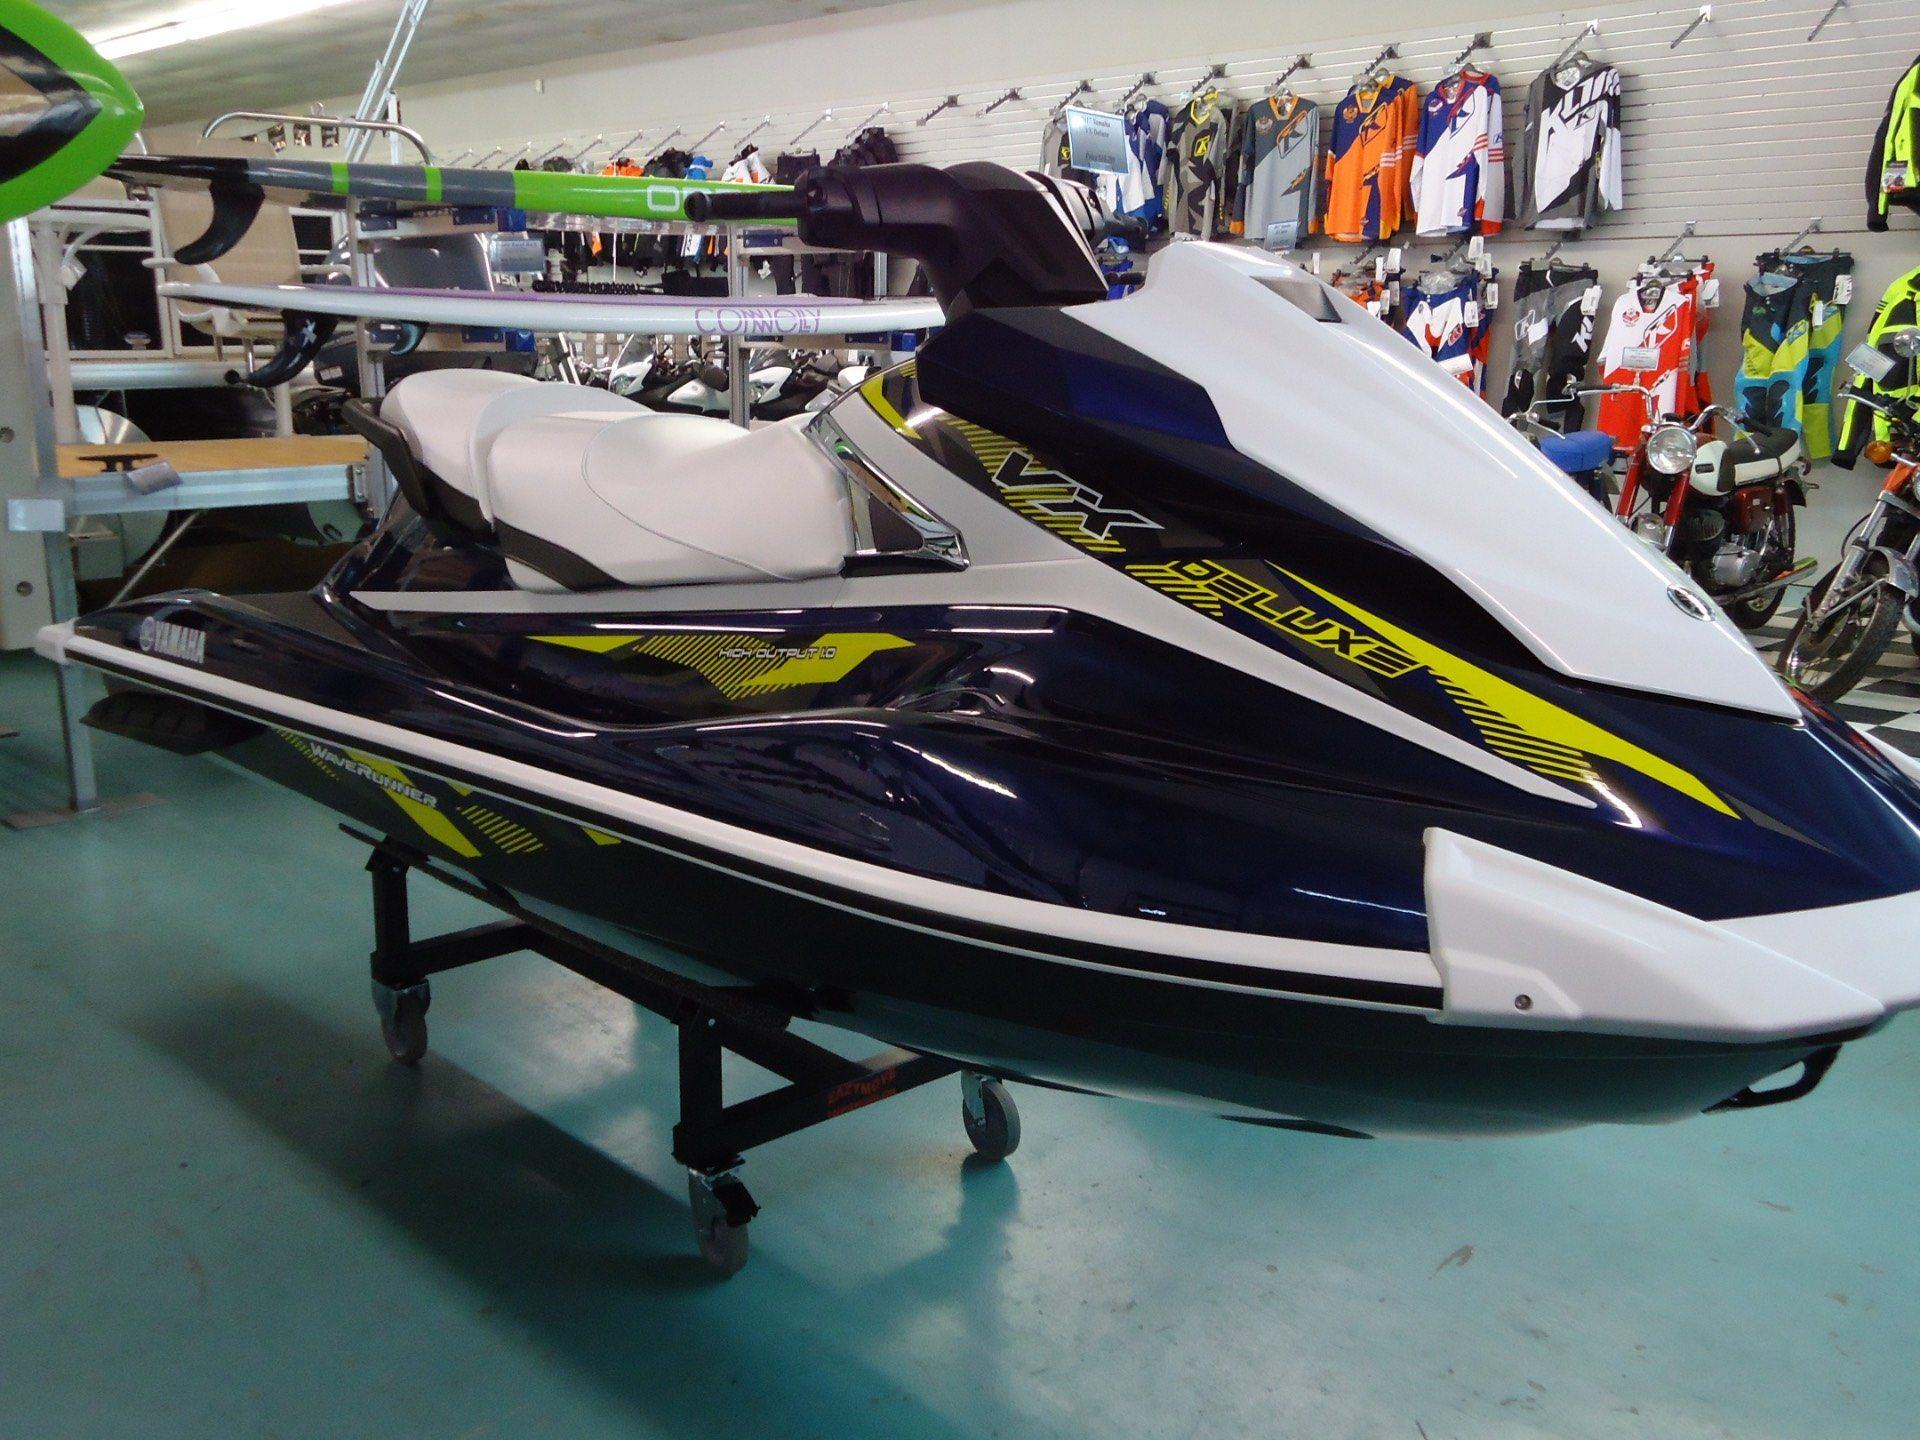 2017 Yamaha VX Deluxe 5